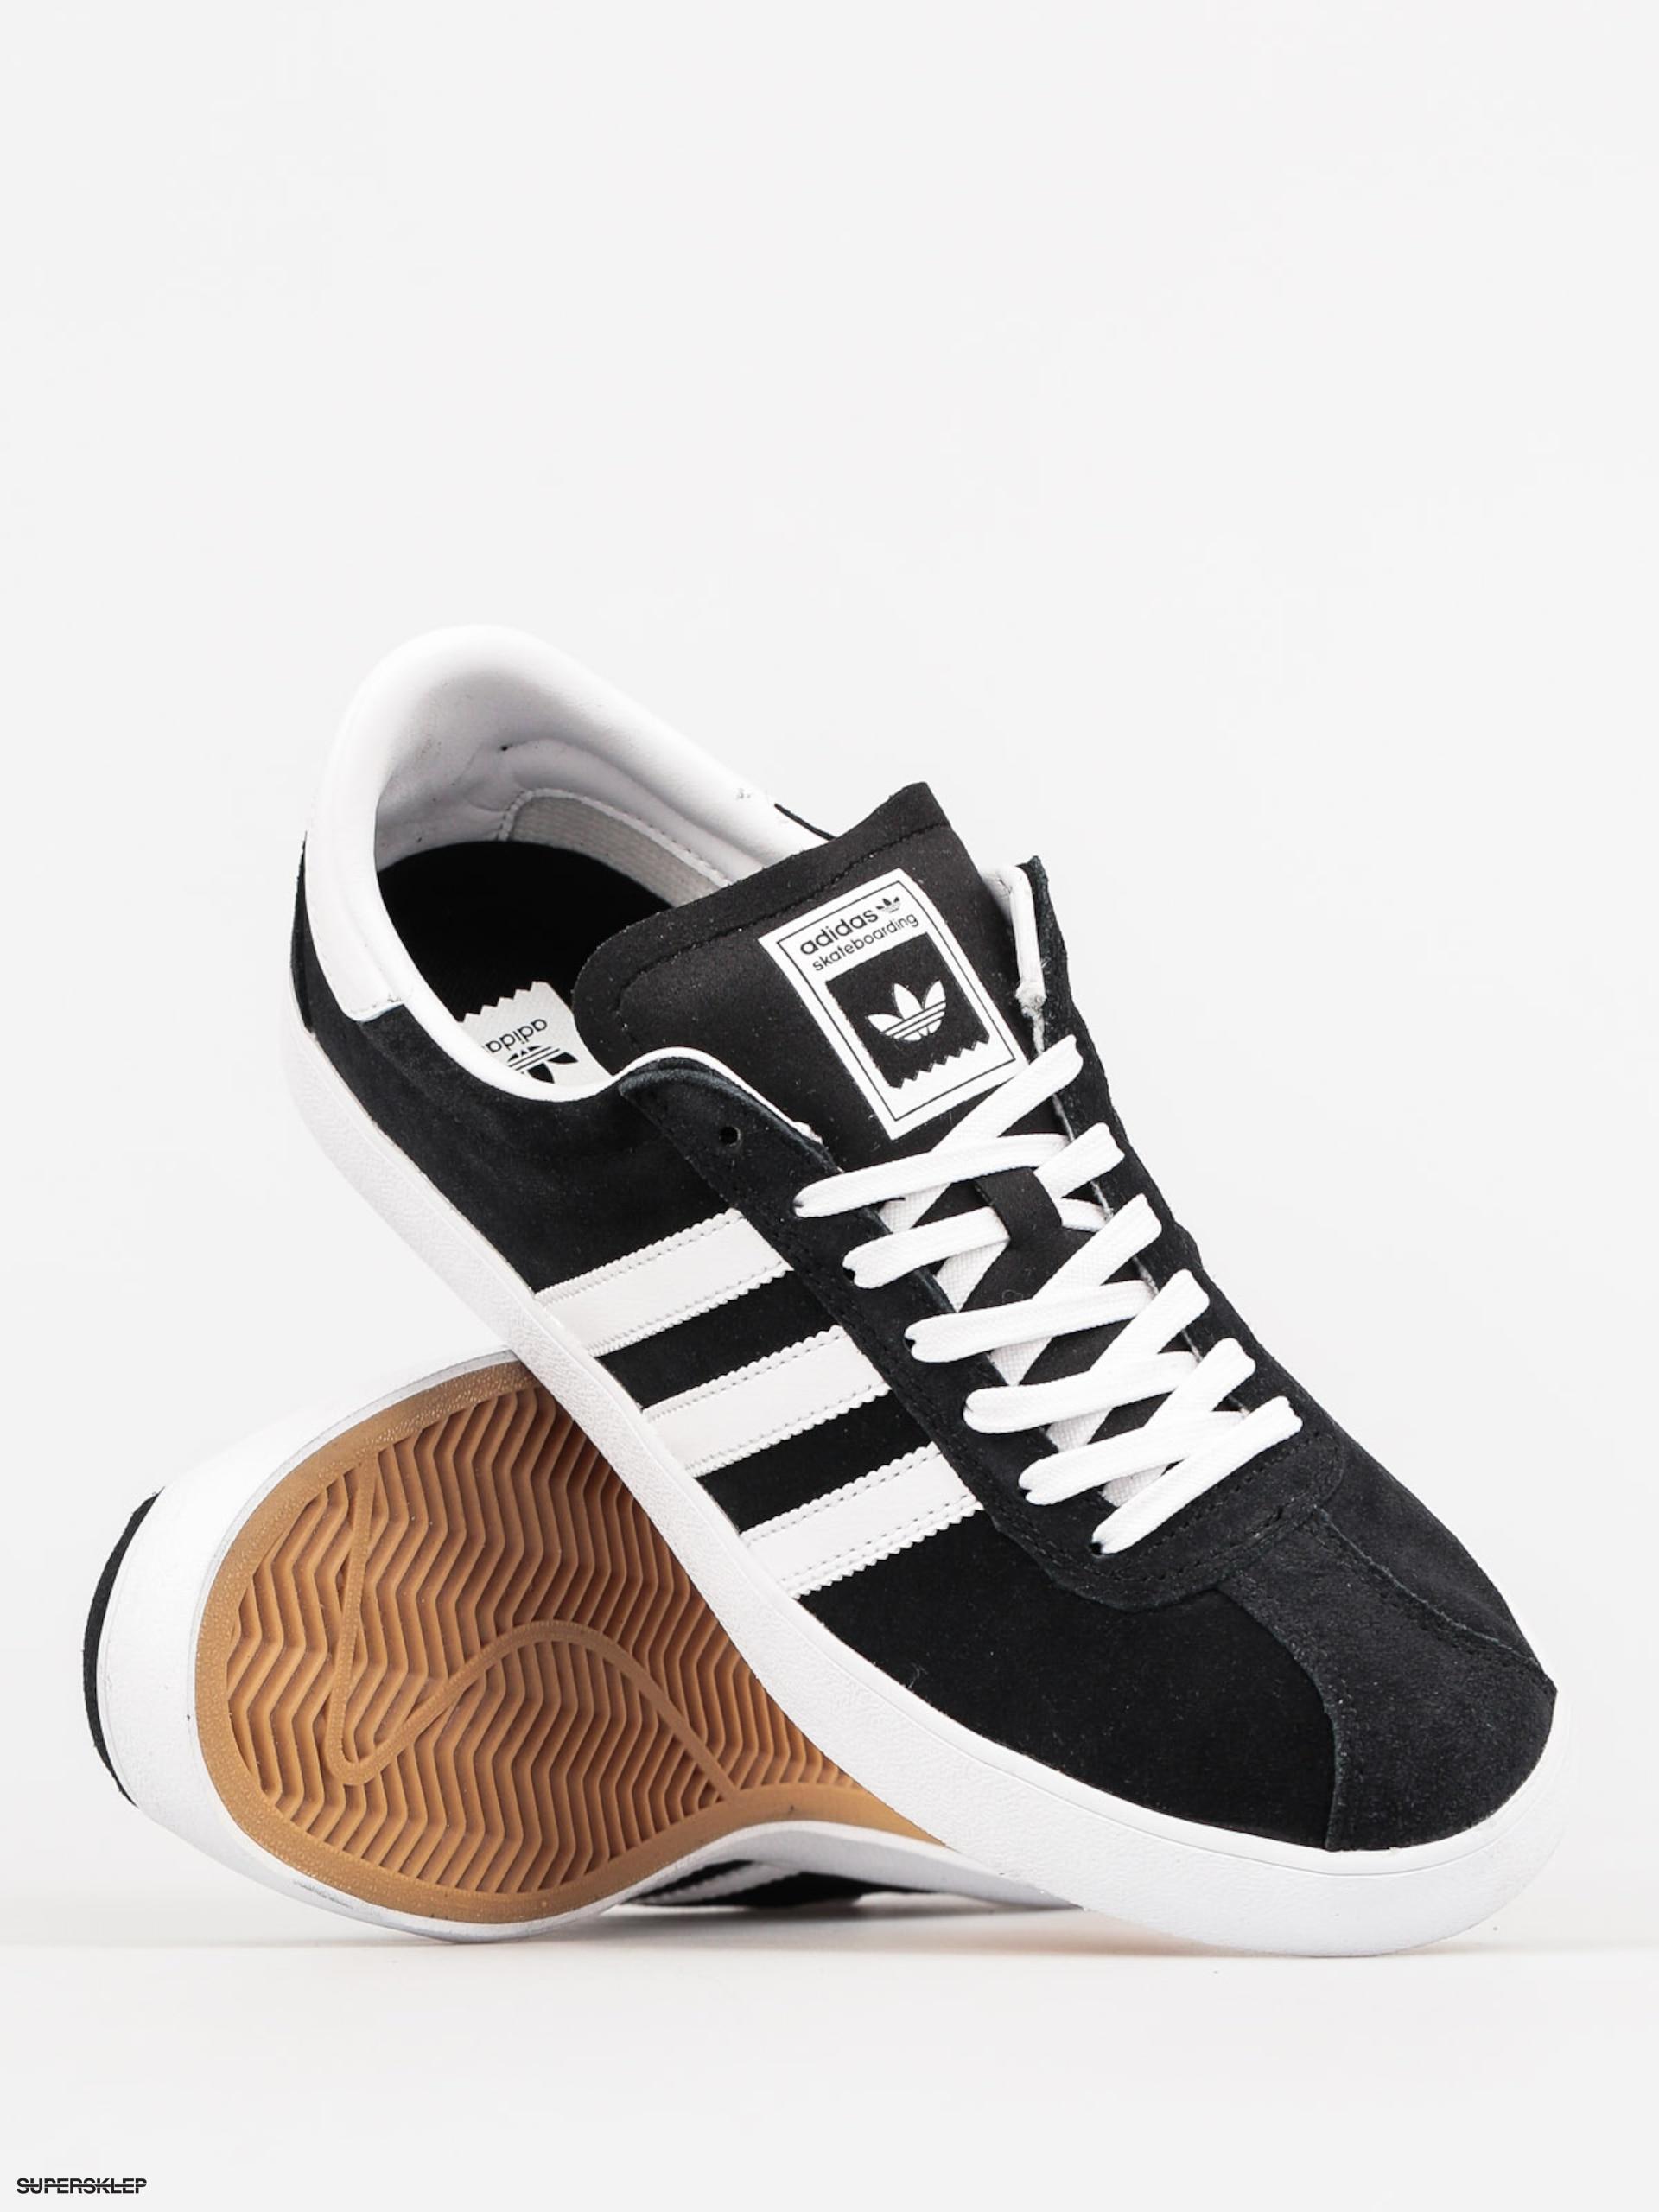 4d9383a9d6614 Buty adidas Skate Adv (cblack/ftwwht/gum4)